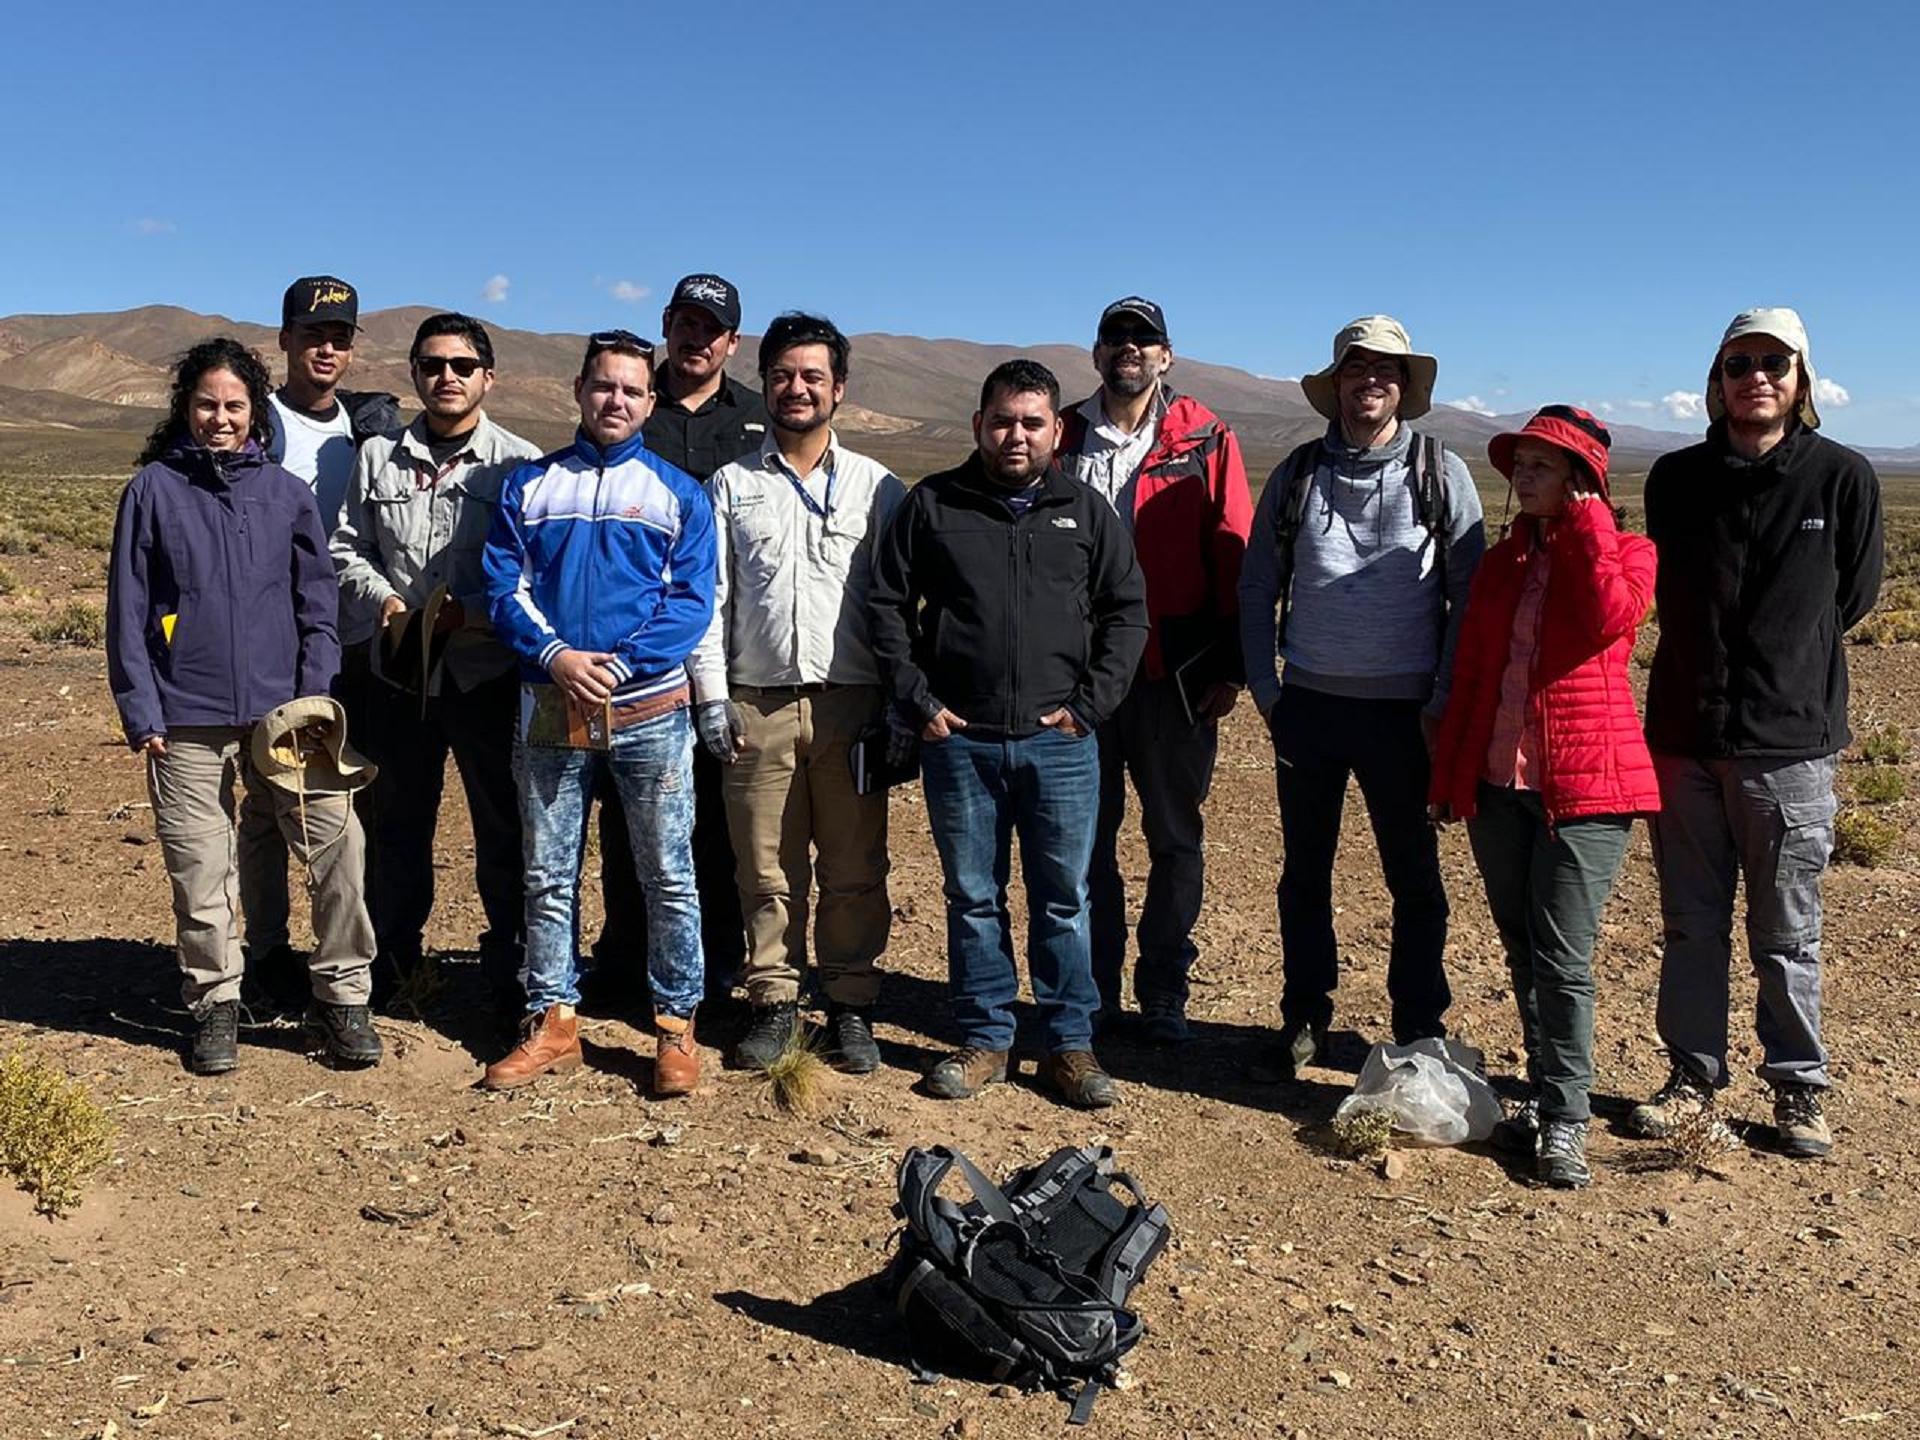 Participantes no curso de metalogenia na visita à mina de Chinchillas (Pb-Zn-Ag)